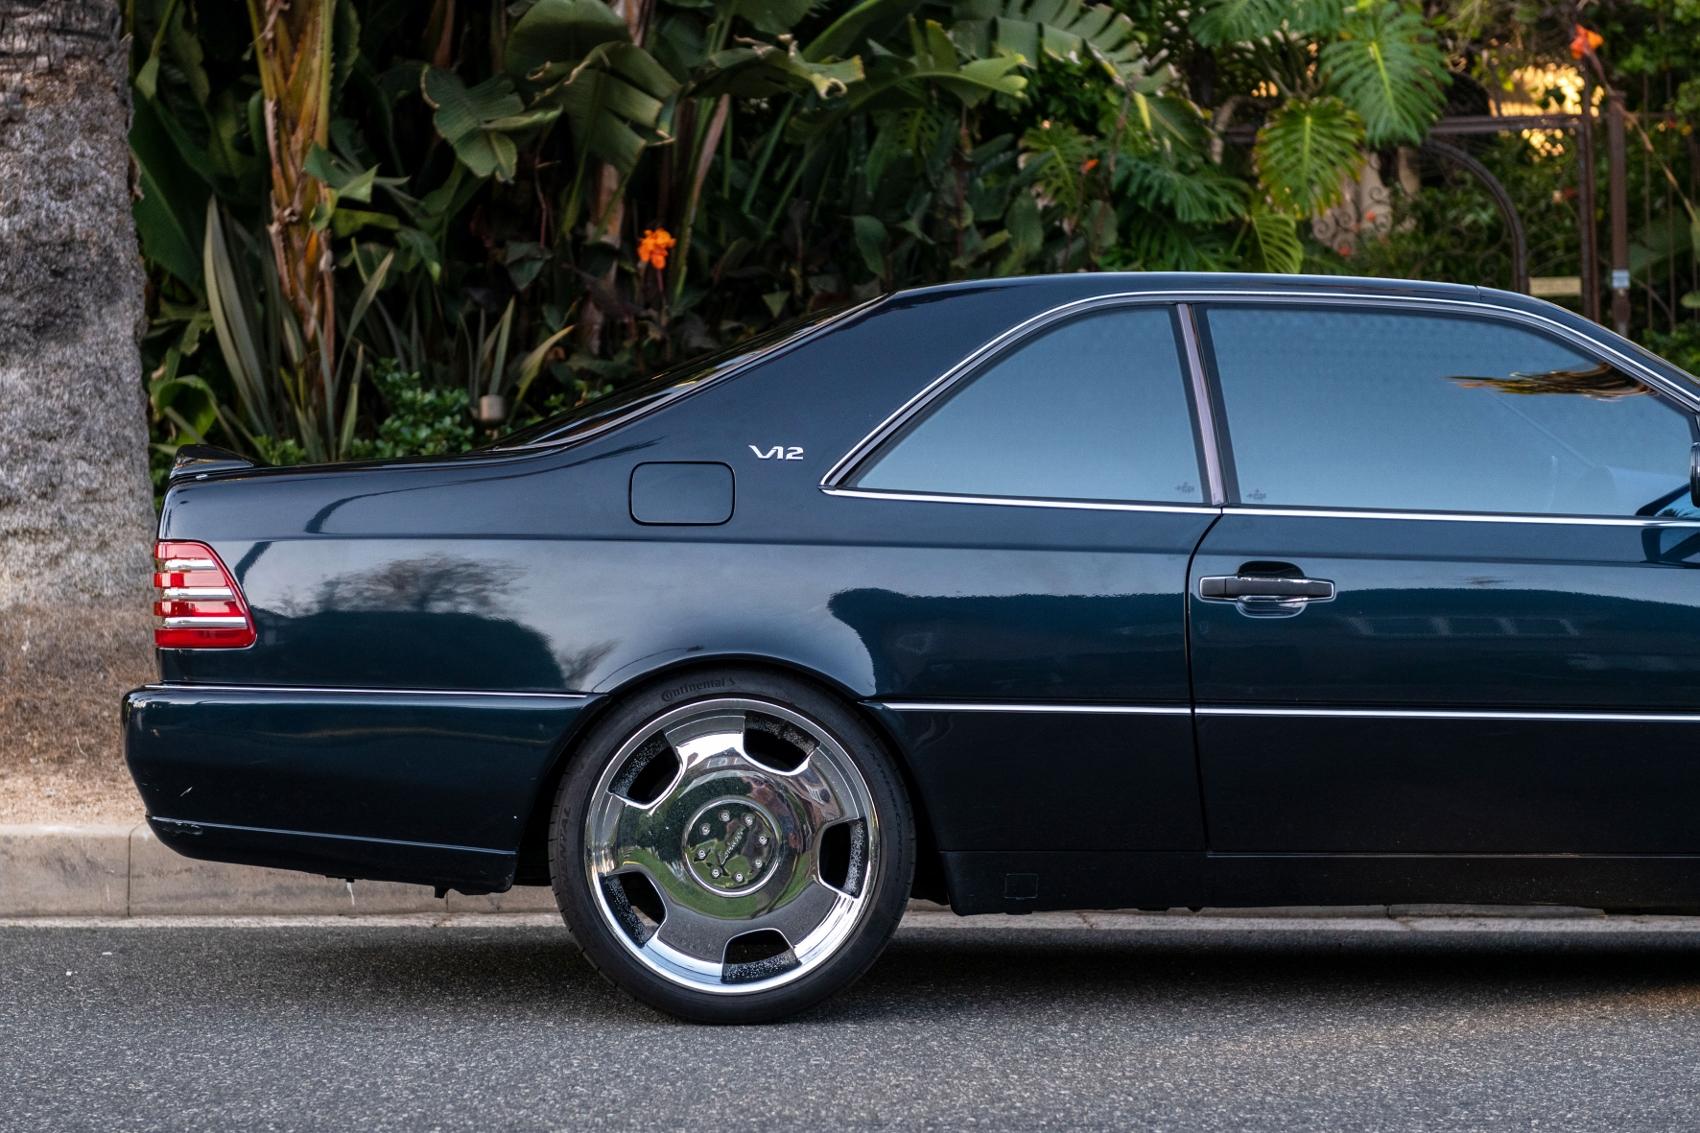 Pozrite si Mercedes S600 Michaela Jordana z roku 1996 IGMspXqr7X lorinsercl600ex-jordansidedetailrea